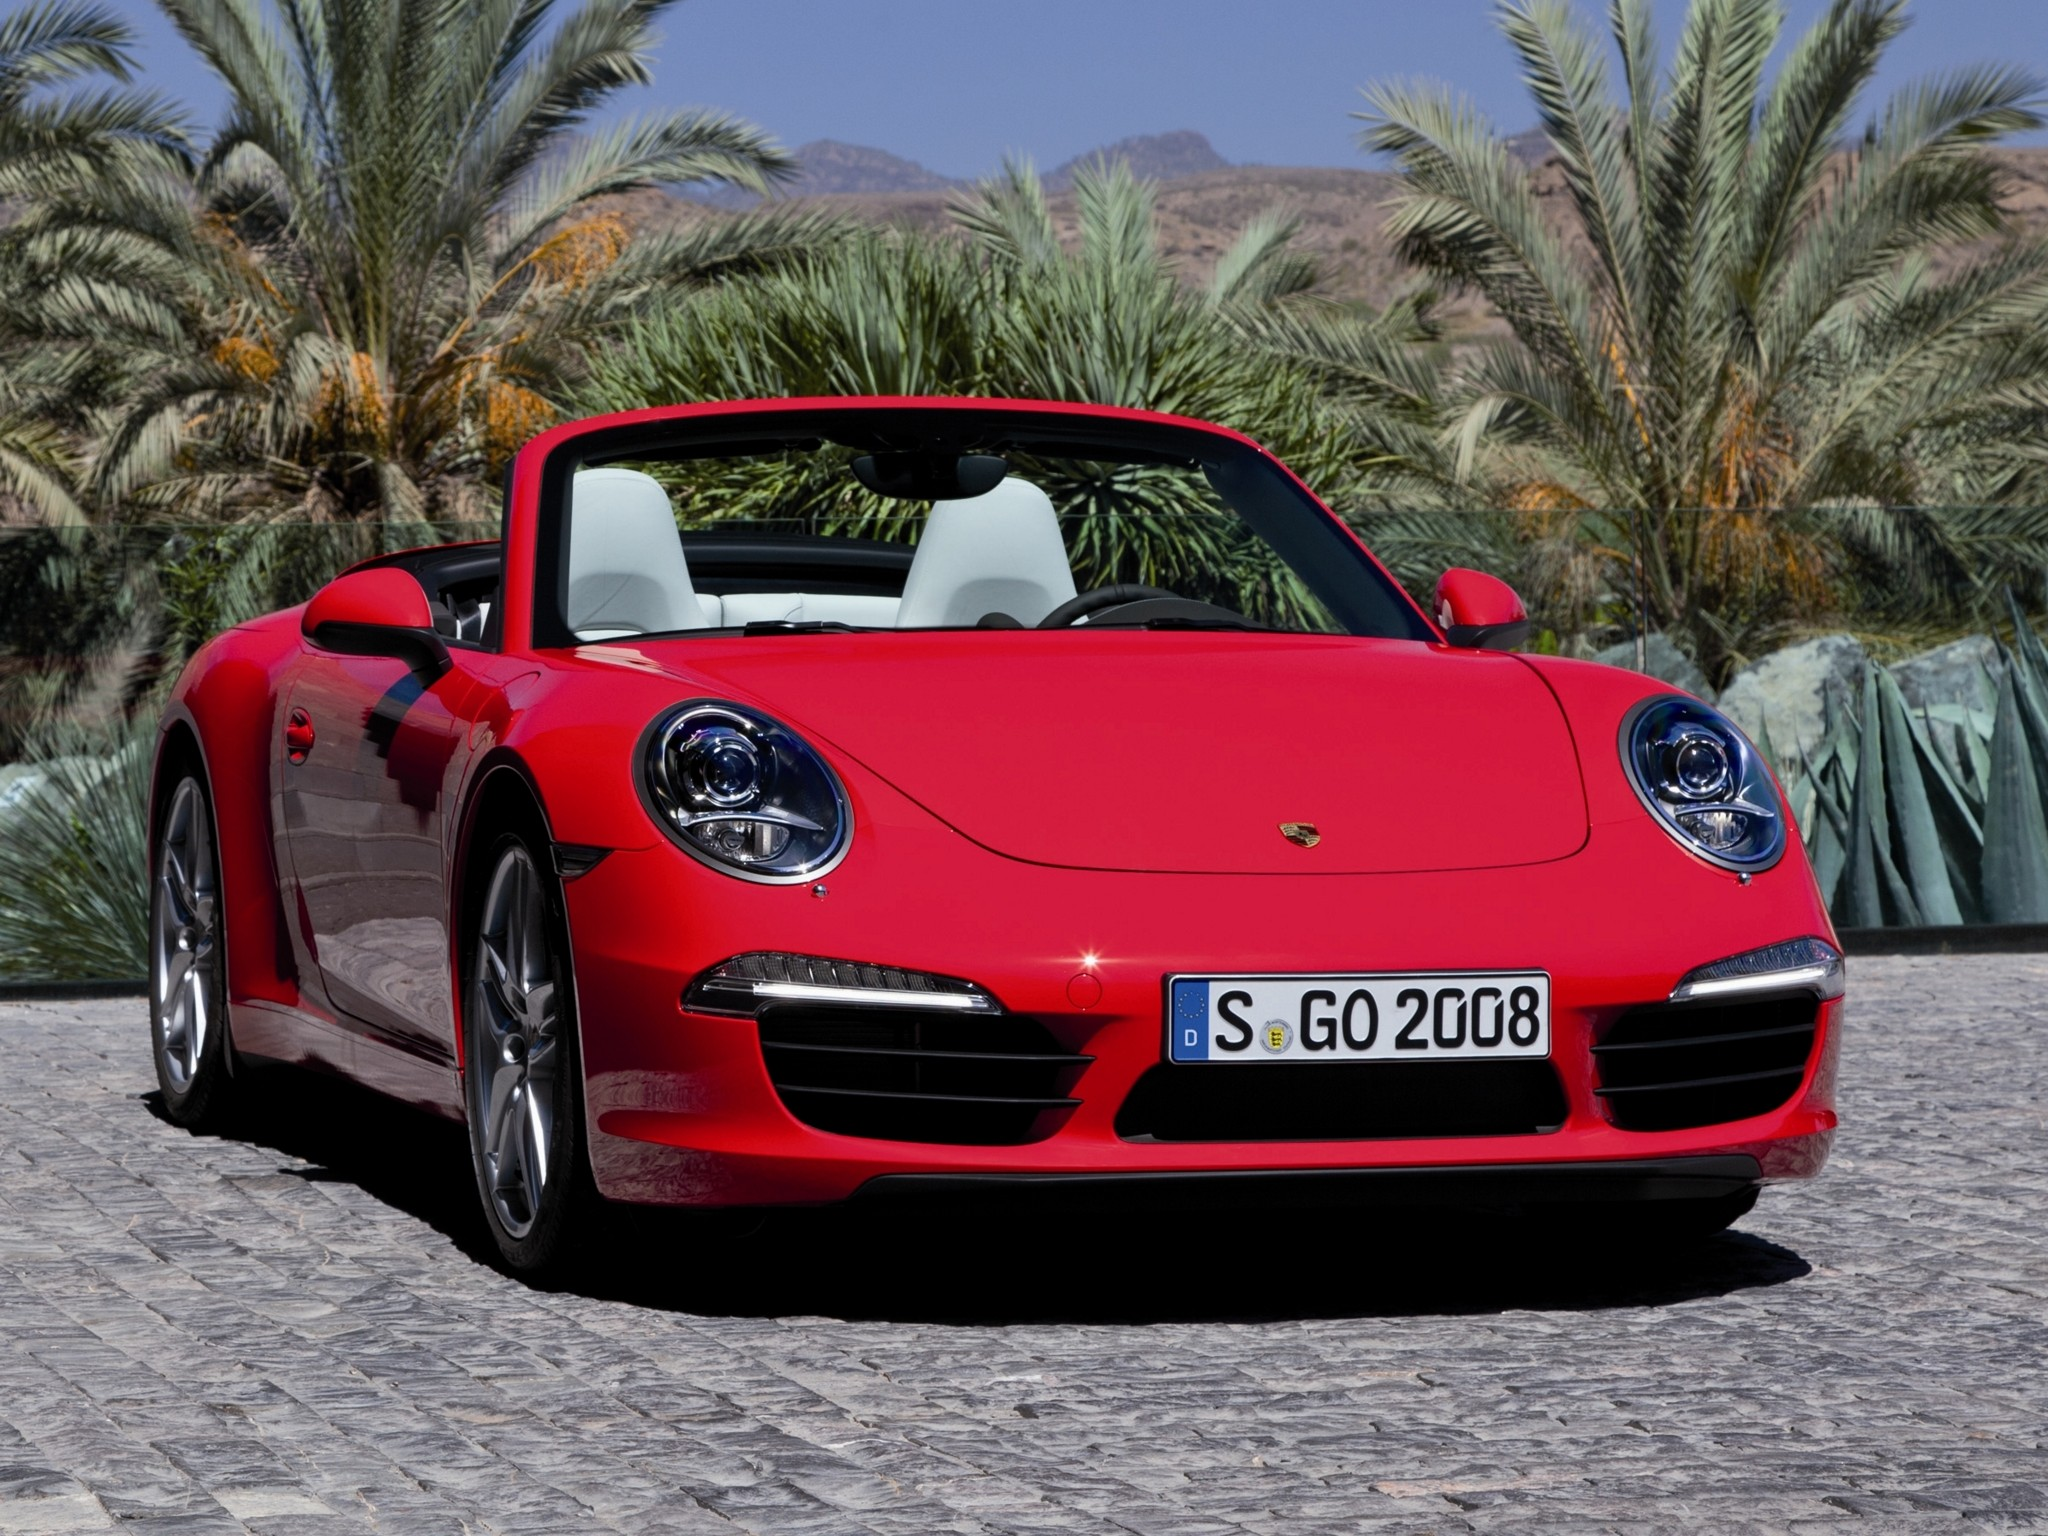 Awe Inspiring Porsche 911 Carrera S Cabriolet 991 2012 2013 2014 2015 Autoevolution Door Handles Collection Olytizonderlifede